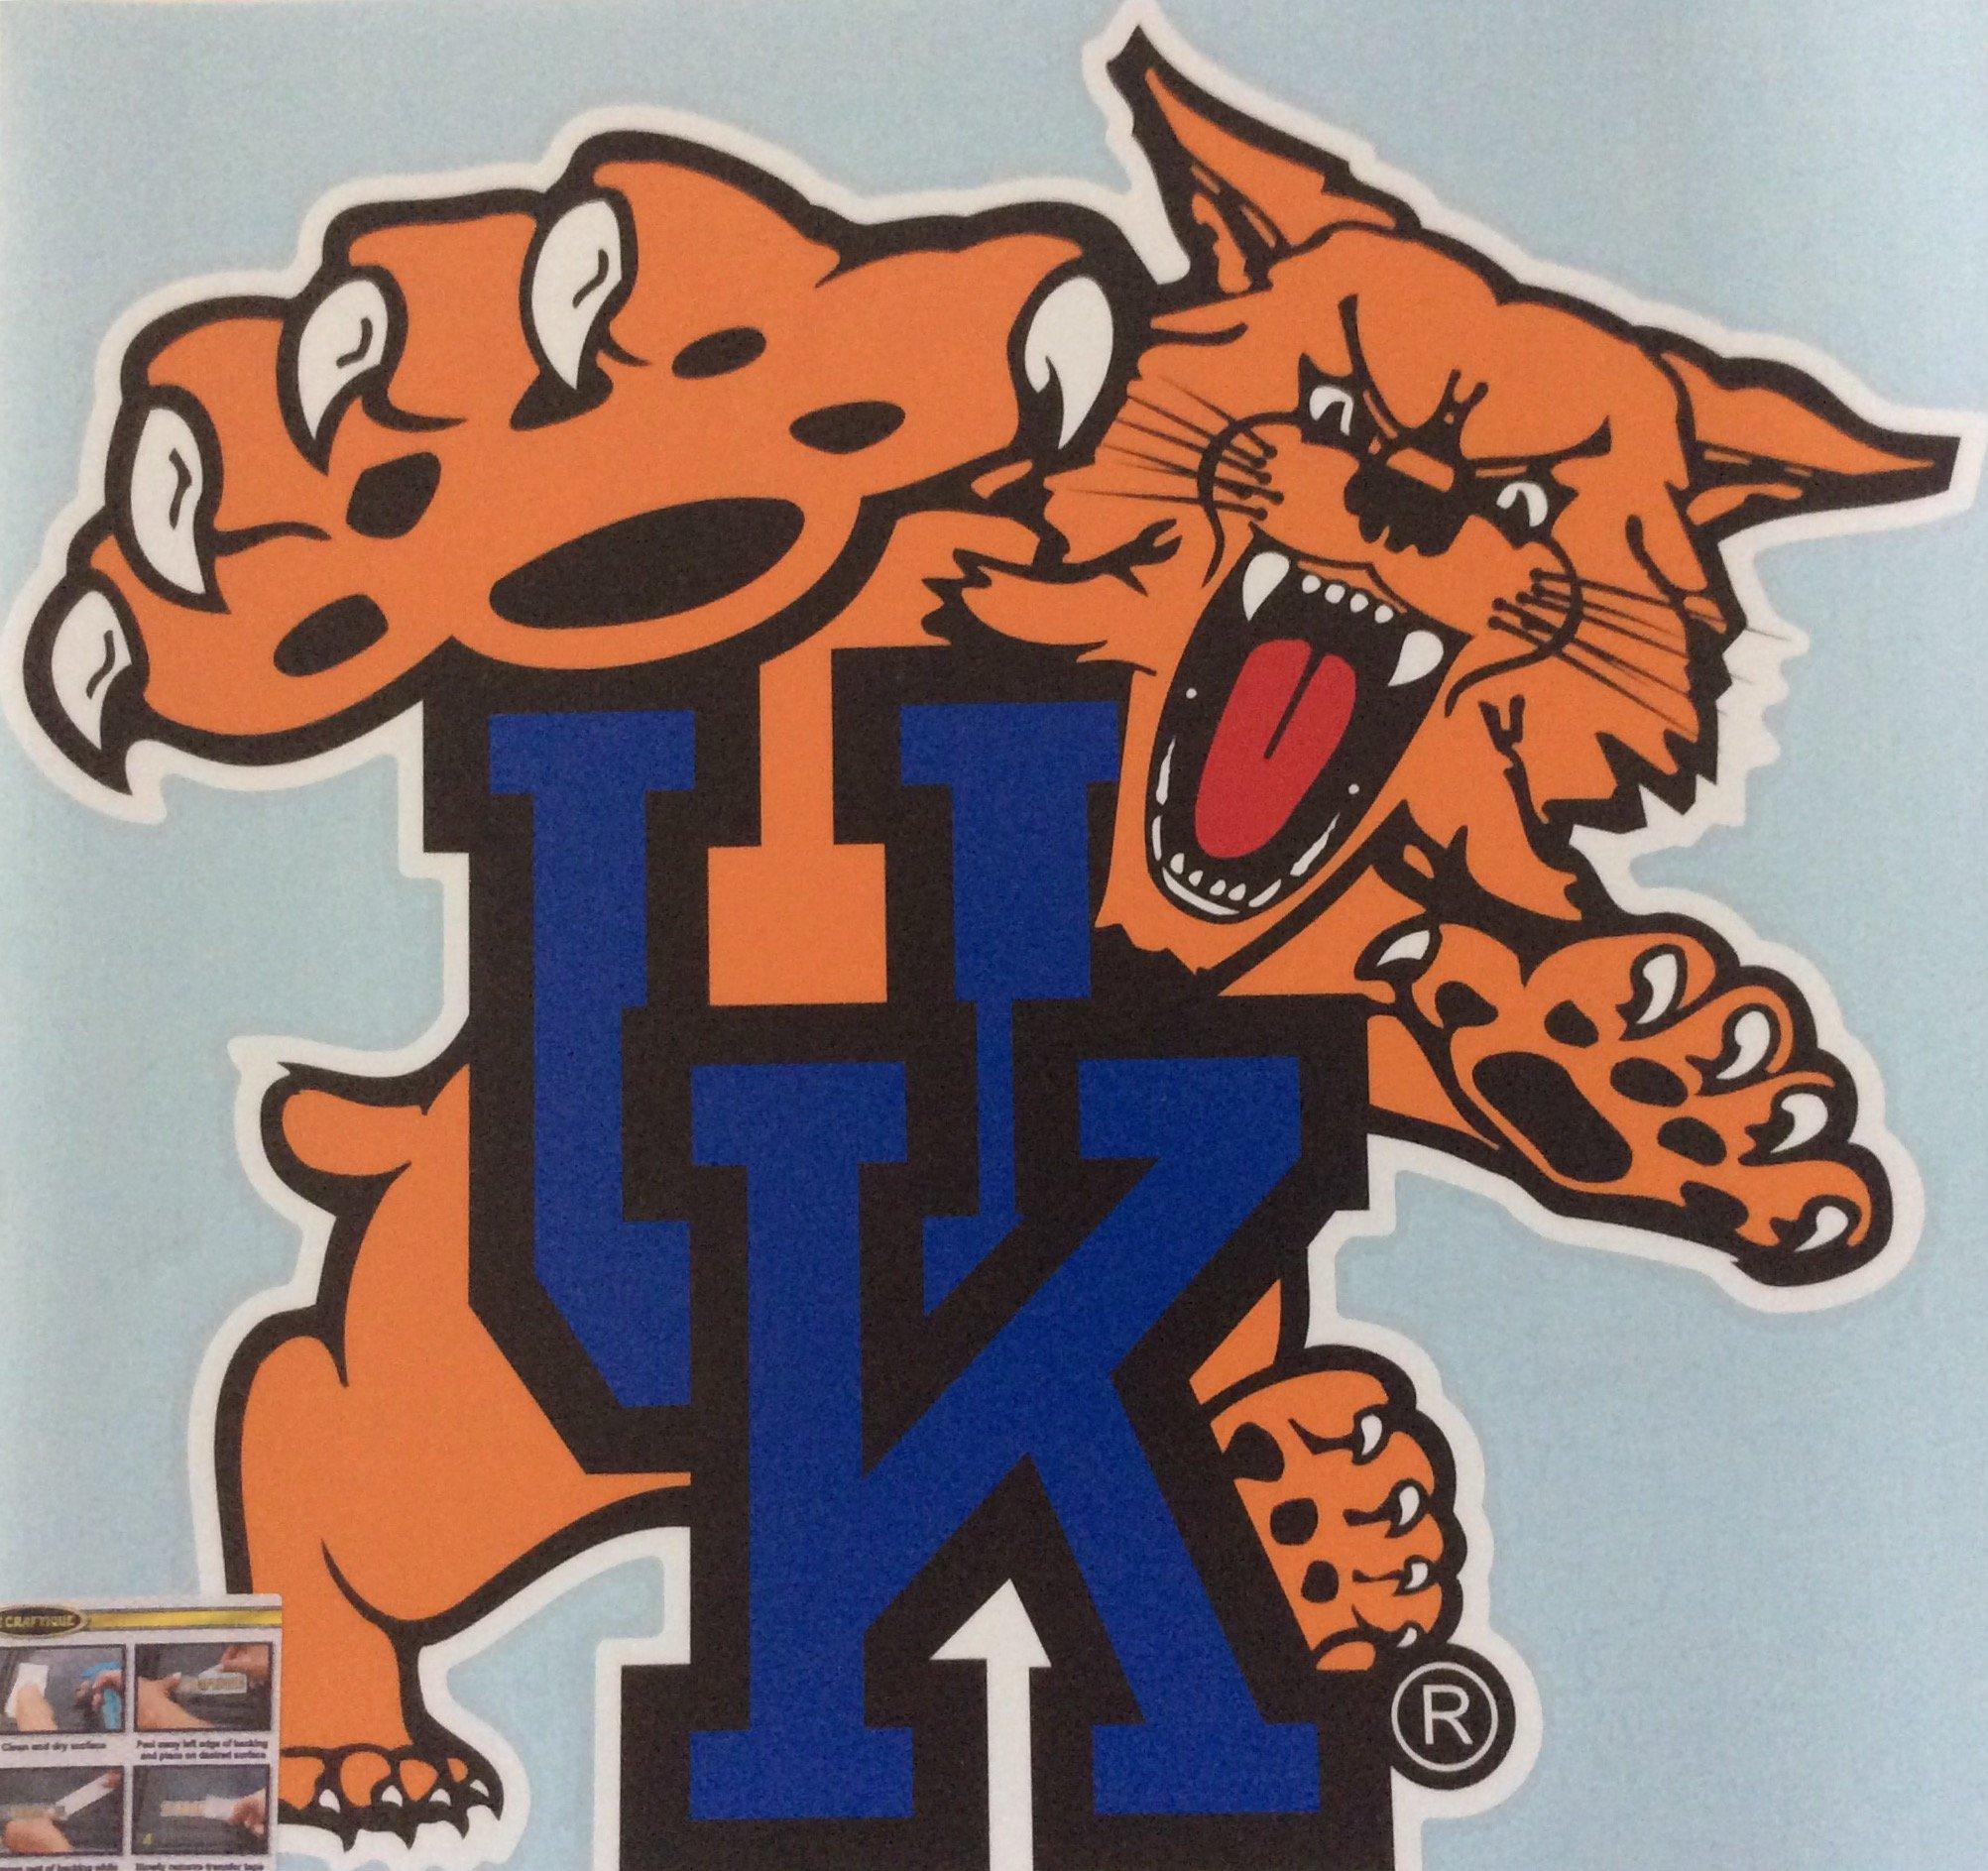 UK, Kentucky Wildcats, XL Premium Wildcat Decal, CORNHOLE, Auto, Made in The USA